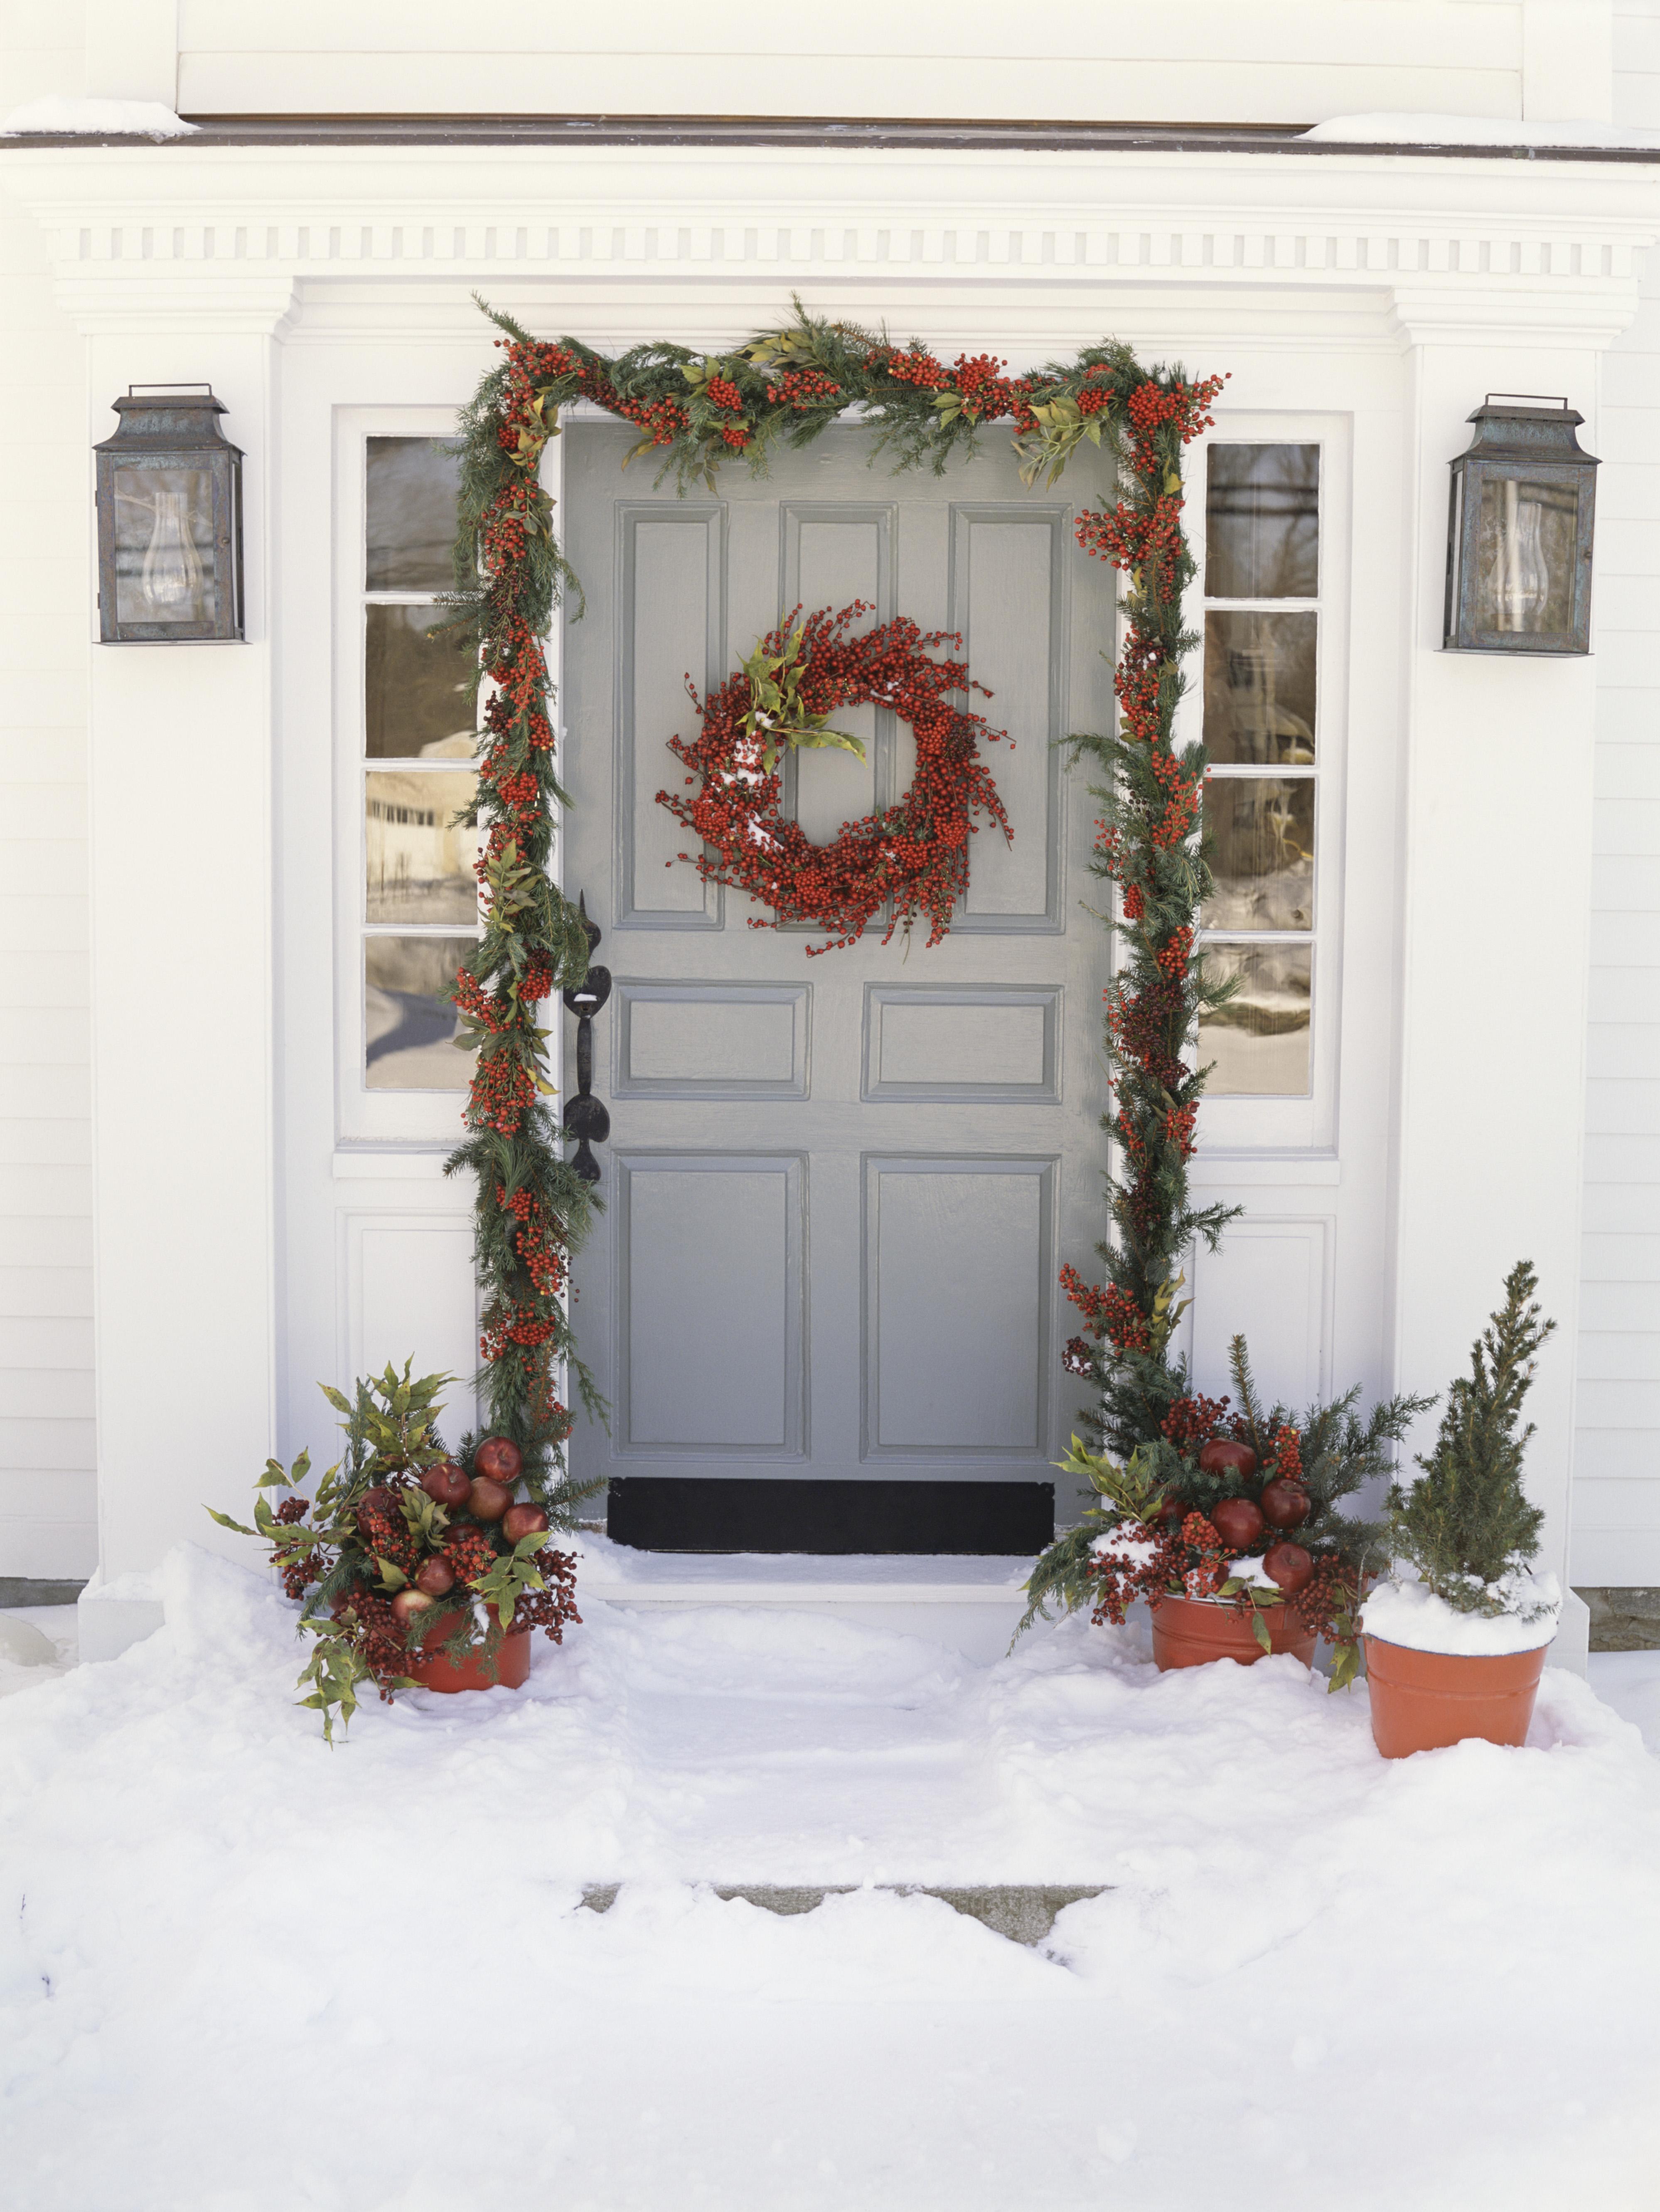 Festive Decor Ideas - Holiday Decorating Tips